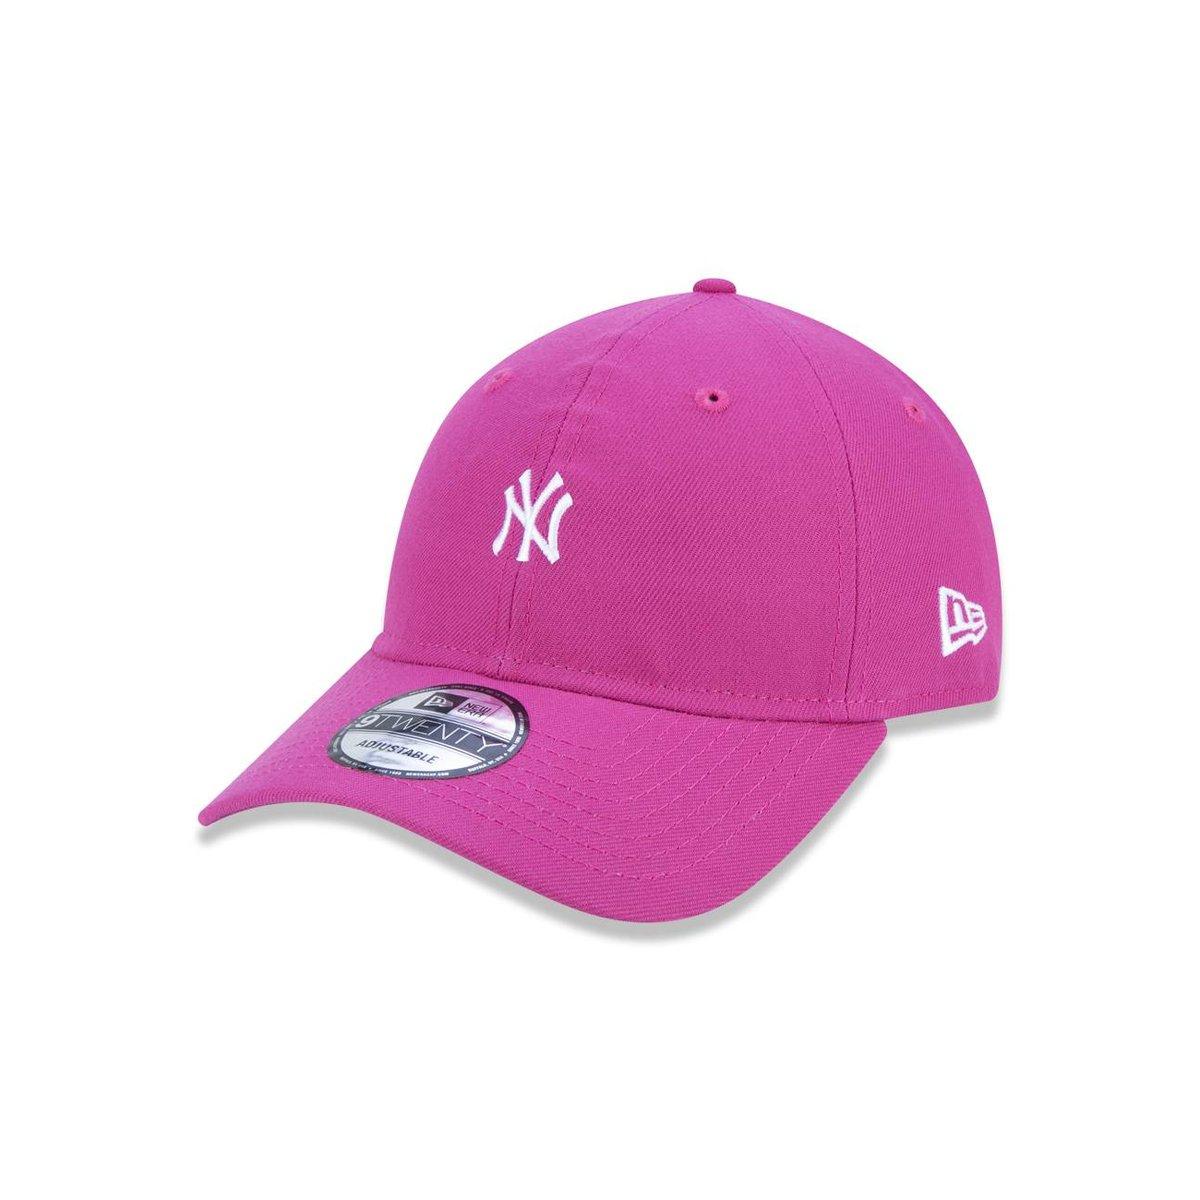 Boné 920 New York Yankees MLB Aba Curva Strapback New Era - Compre Agora  1512676e2ae